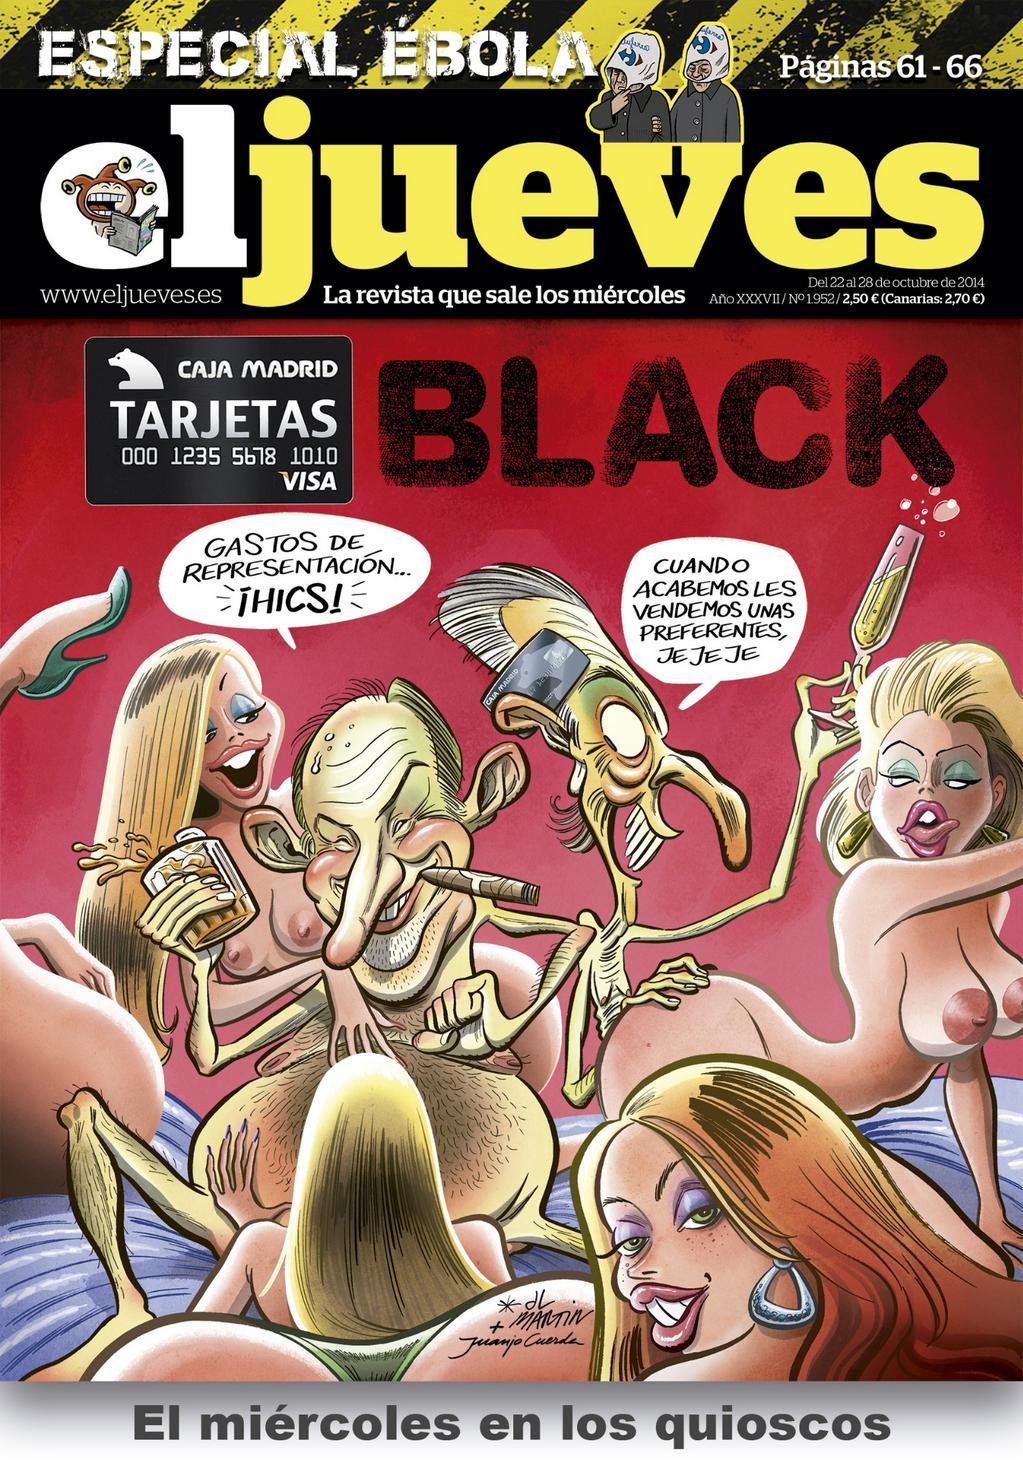 prostitutas en el poligono tarjetas black prostitutas